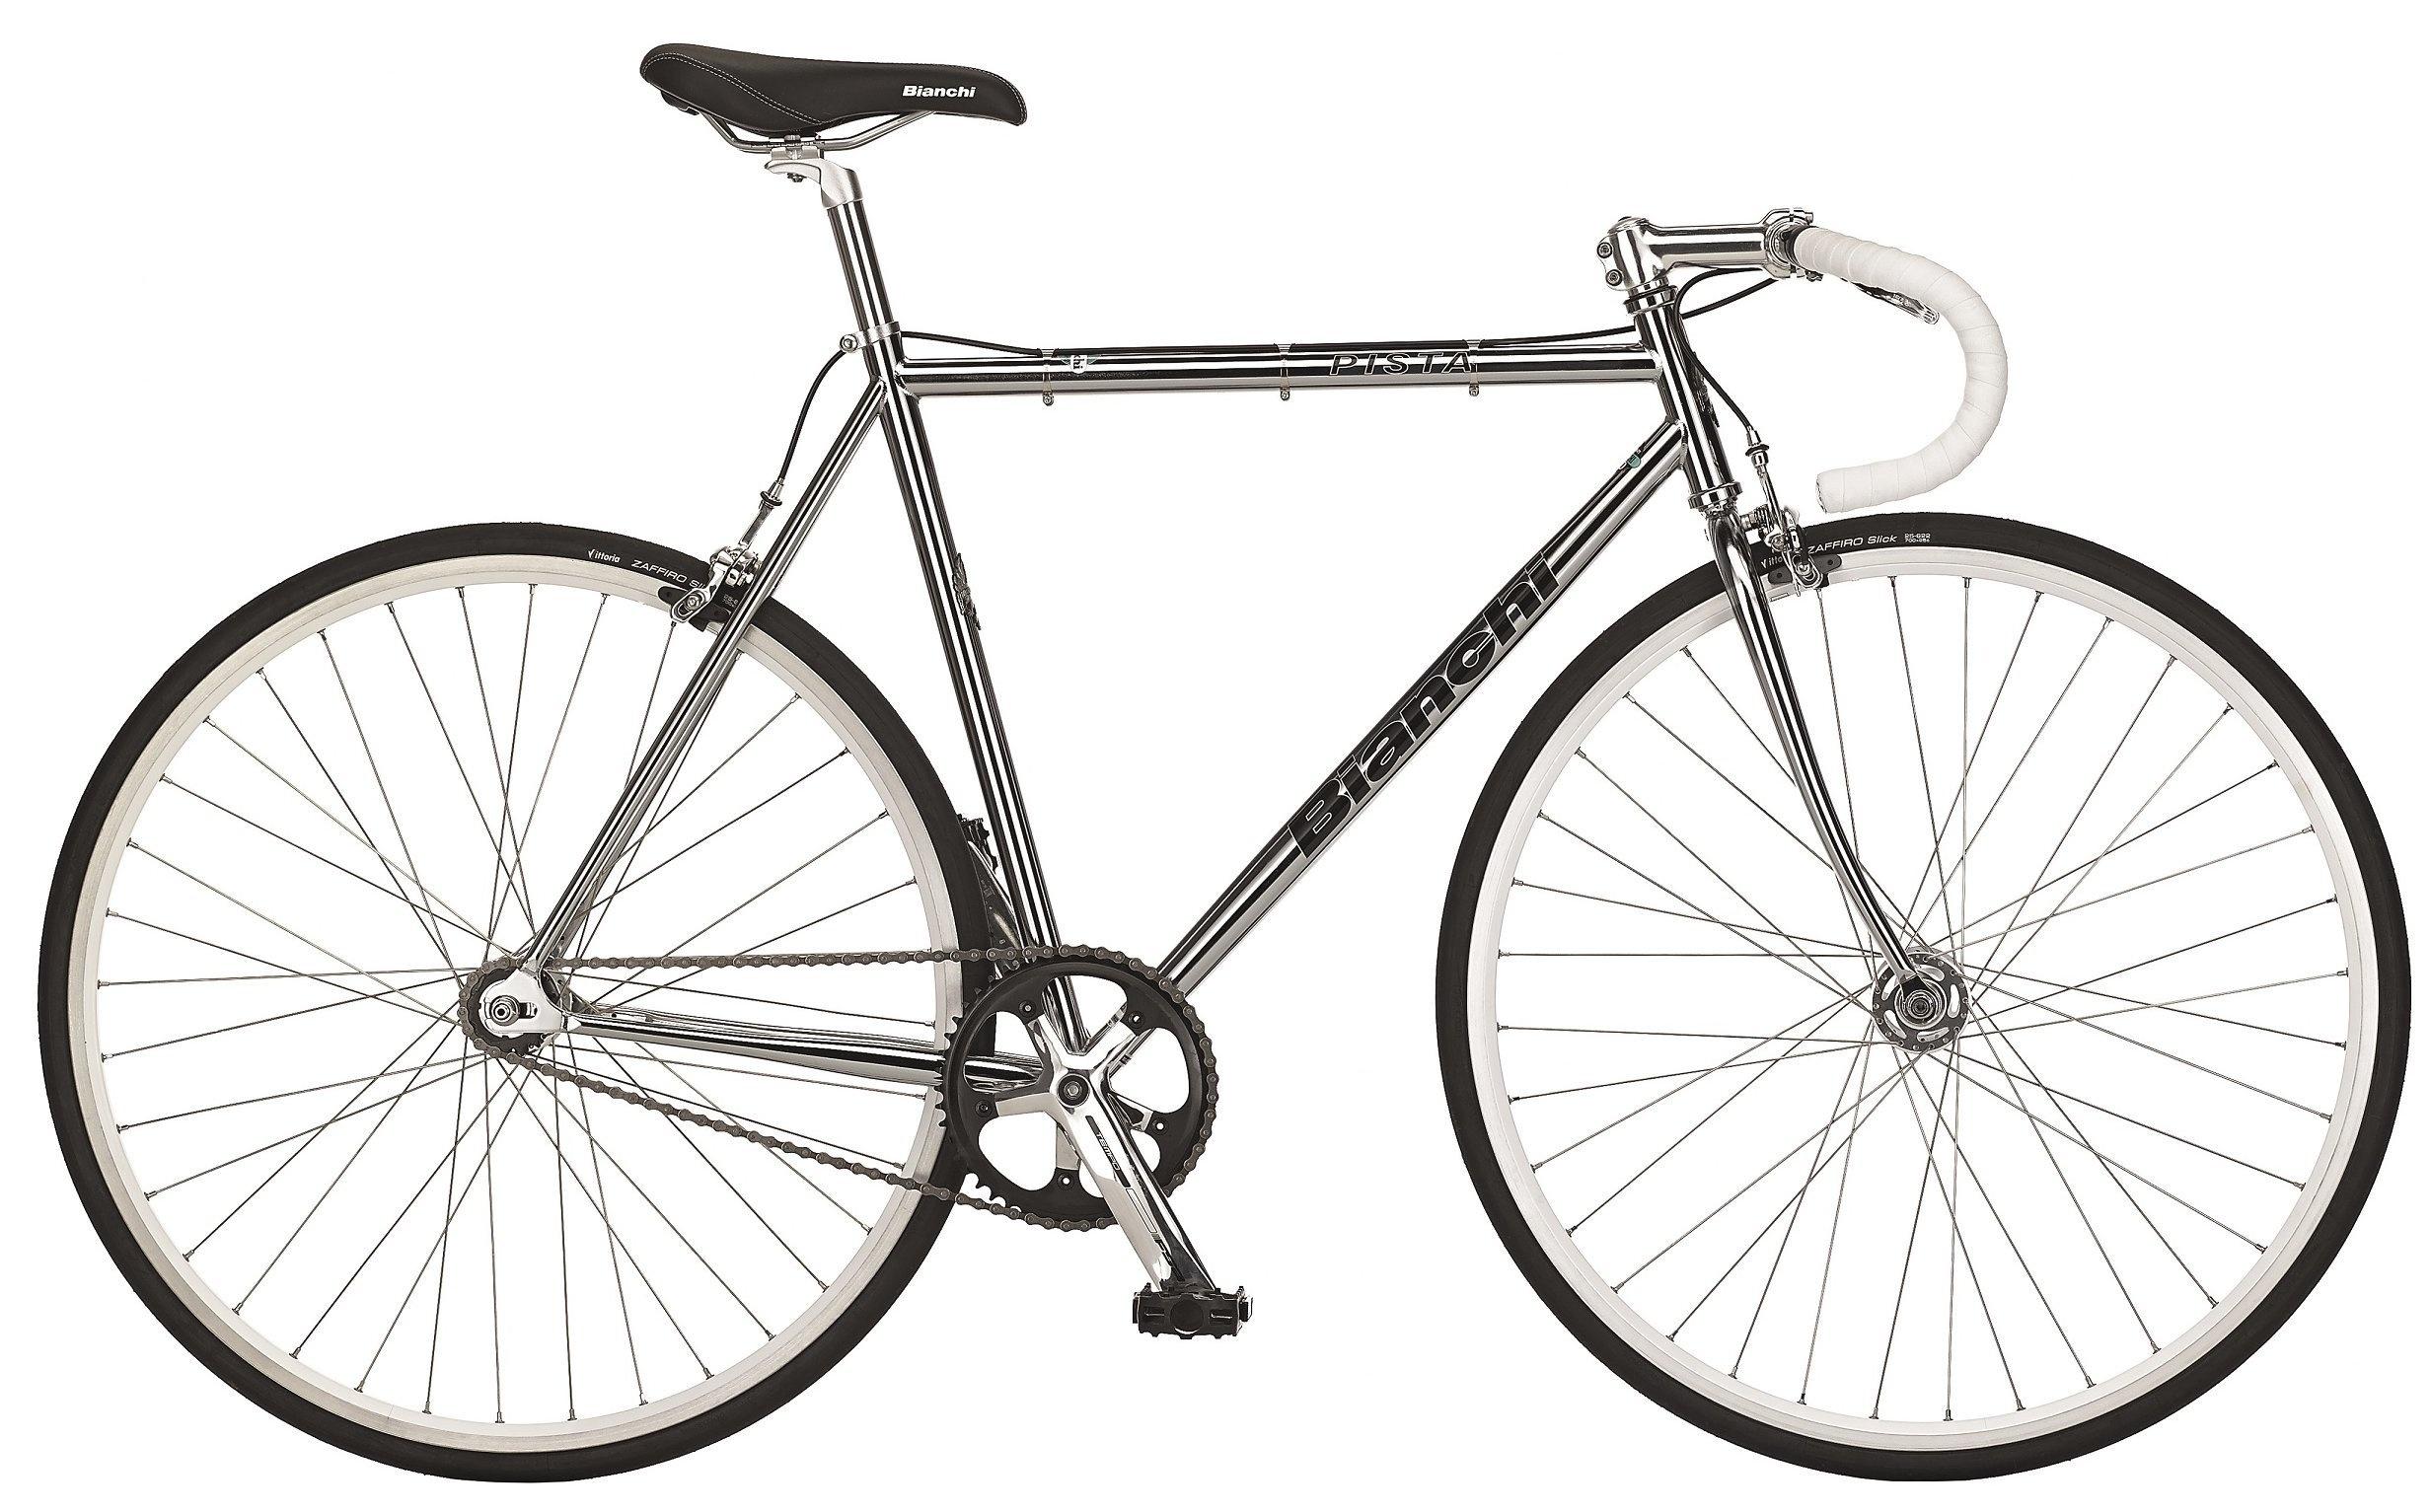 Bianchi Pista Steel 1g - Sølv